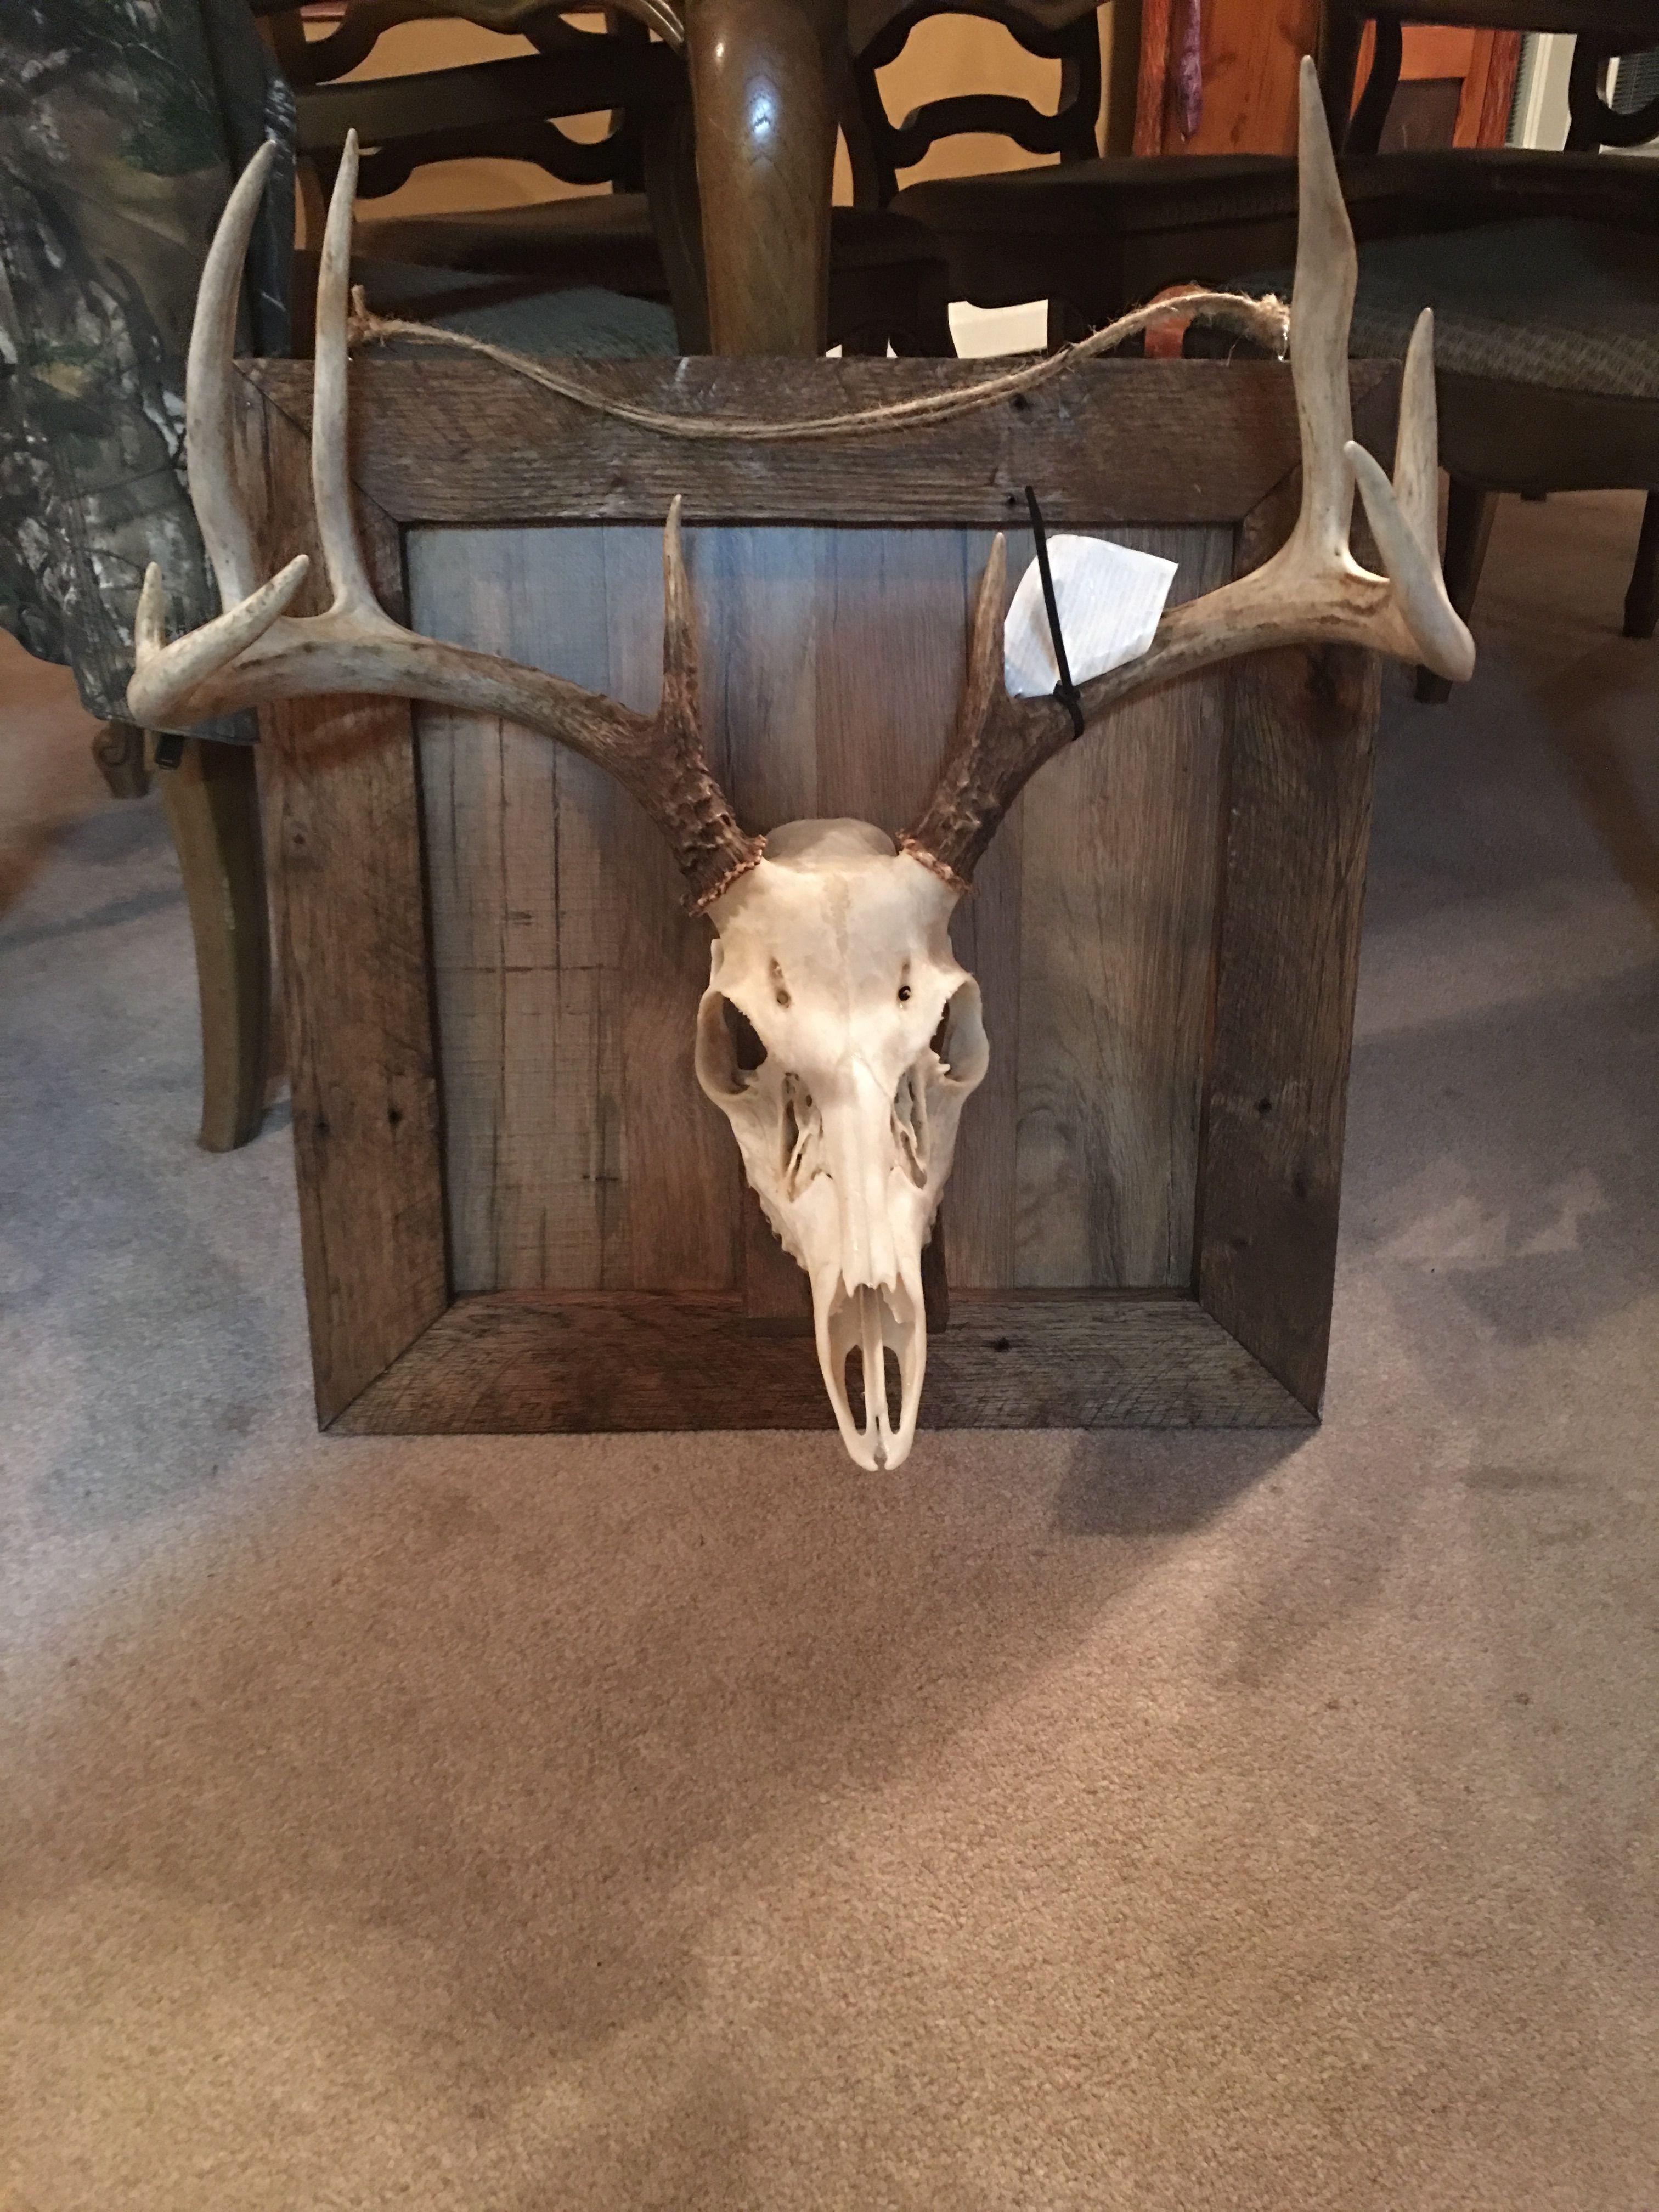 Custom Handmade European Mount Deer Hunting Decor Deer Antler Decor Deer Mount Decor